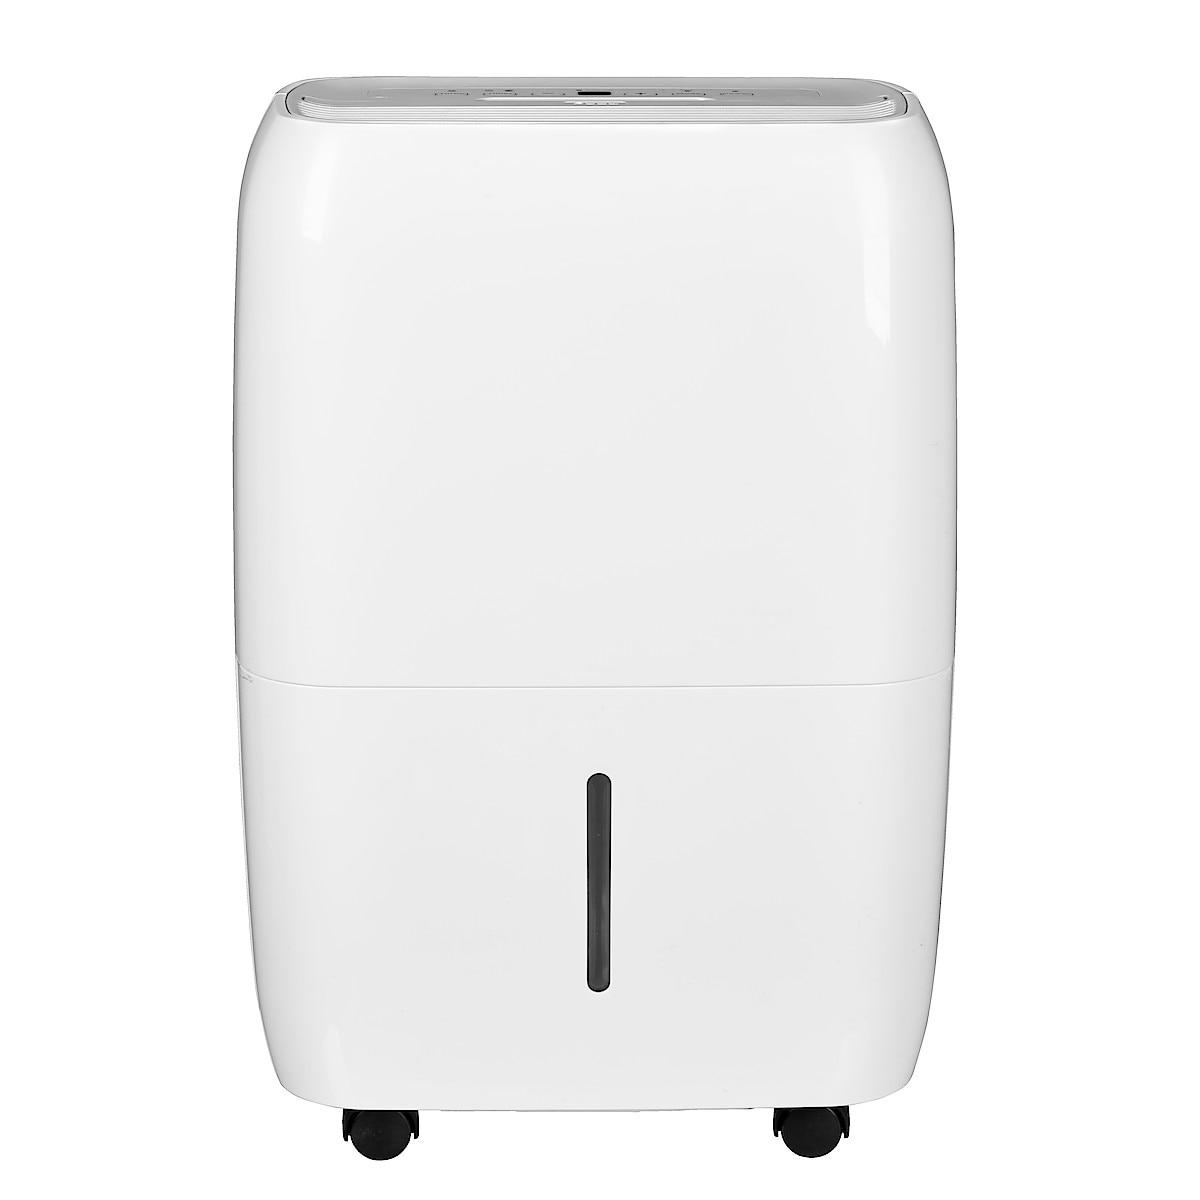 Cotech 20-Litre Dehumidifier